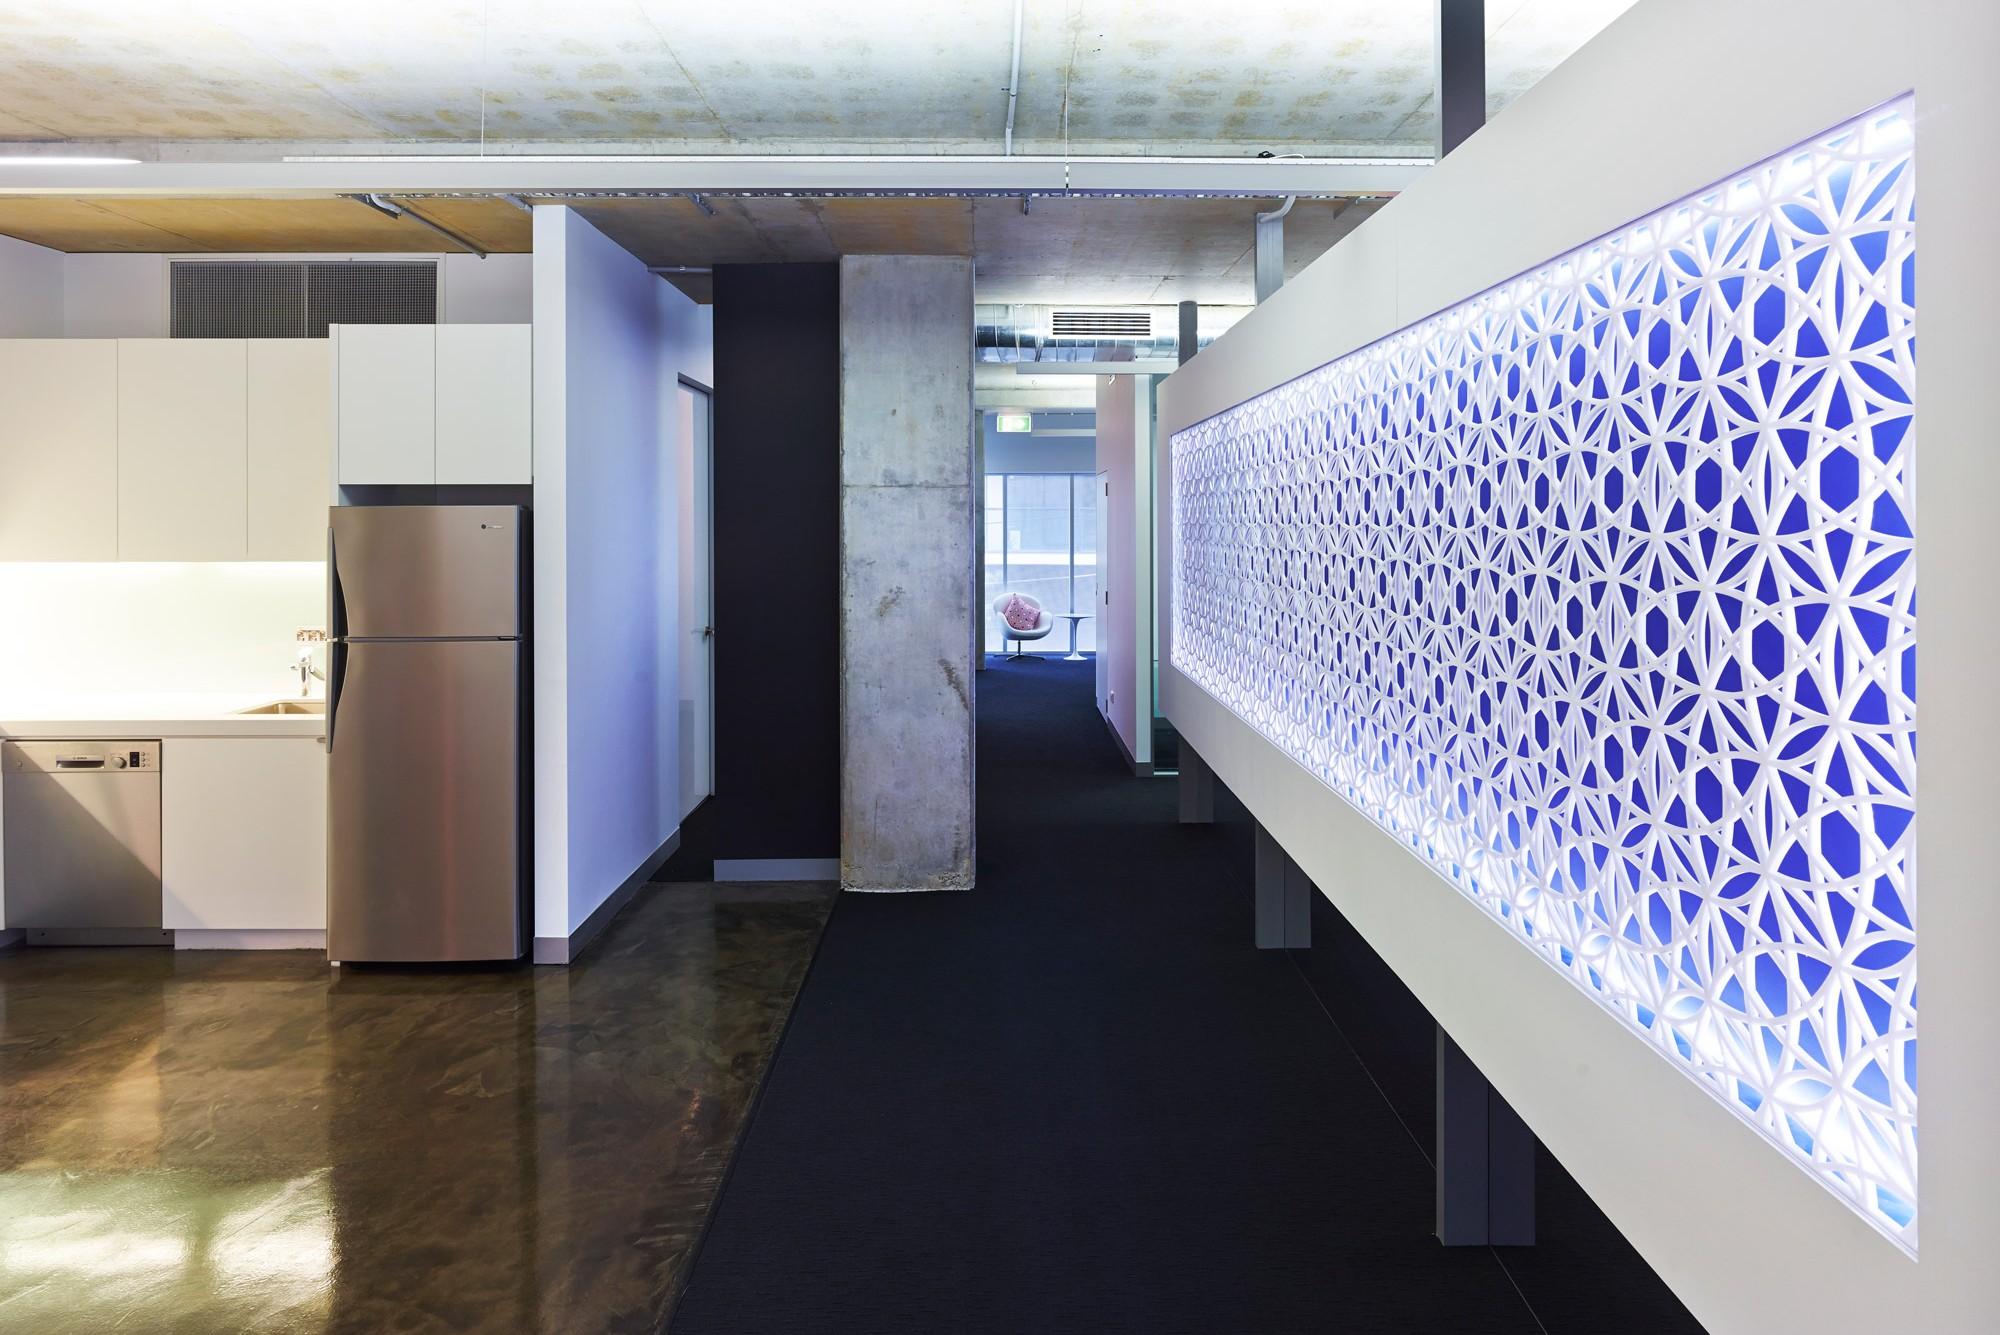 Marketing Office Designers   Coty MarketingMarketing Office Designers for Coty   IN2 Space. Office Designers Melbourne. Home Design Ideas